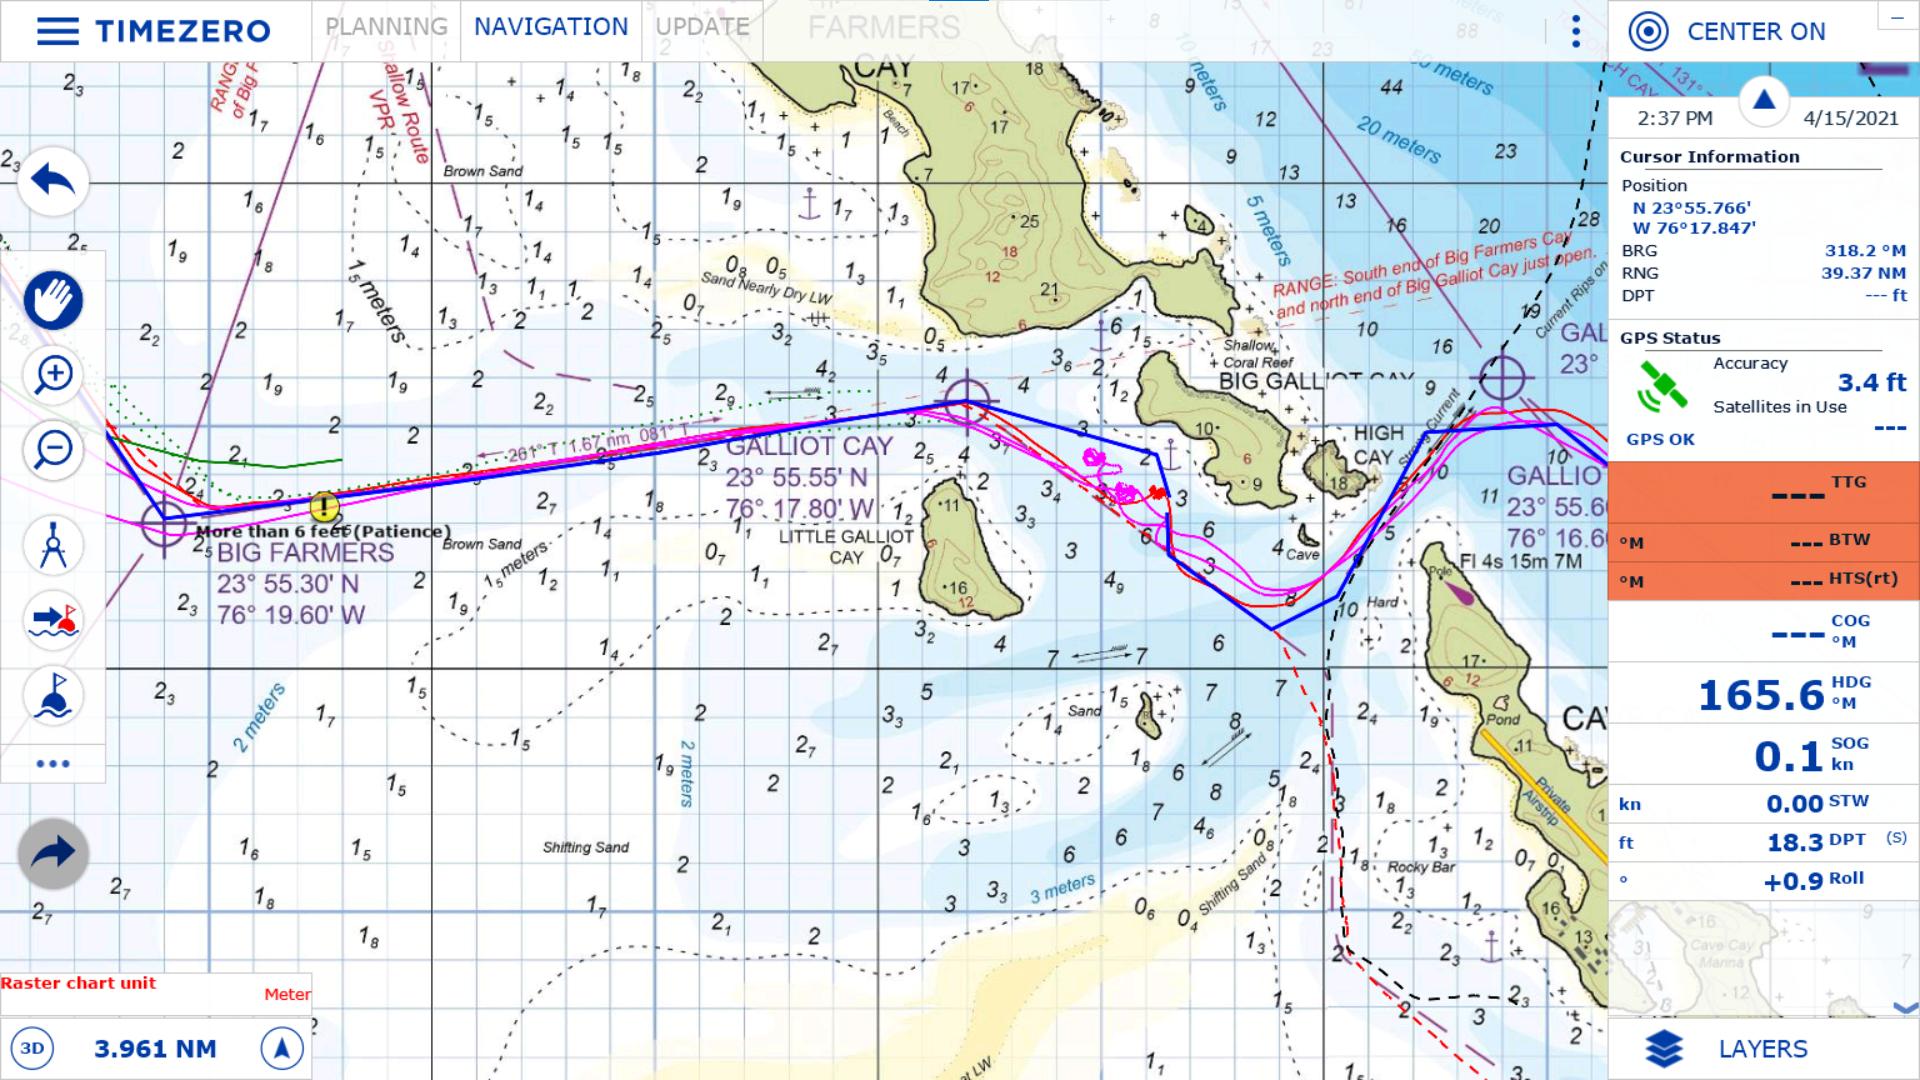 TimeZero showing a section using ExplorerCharts charts